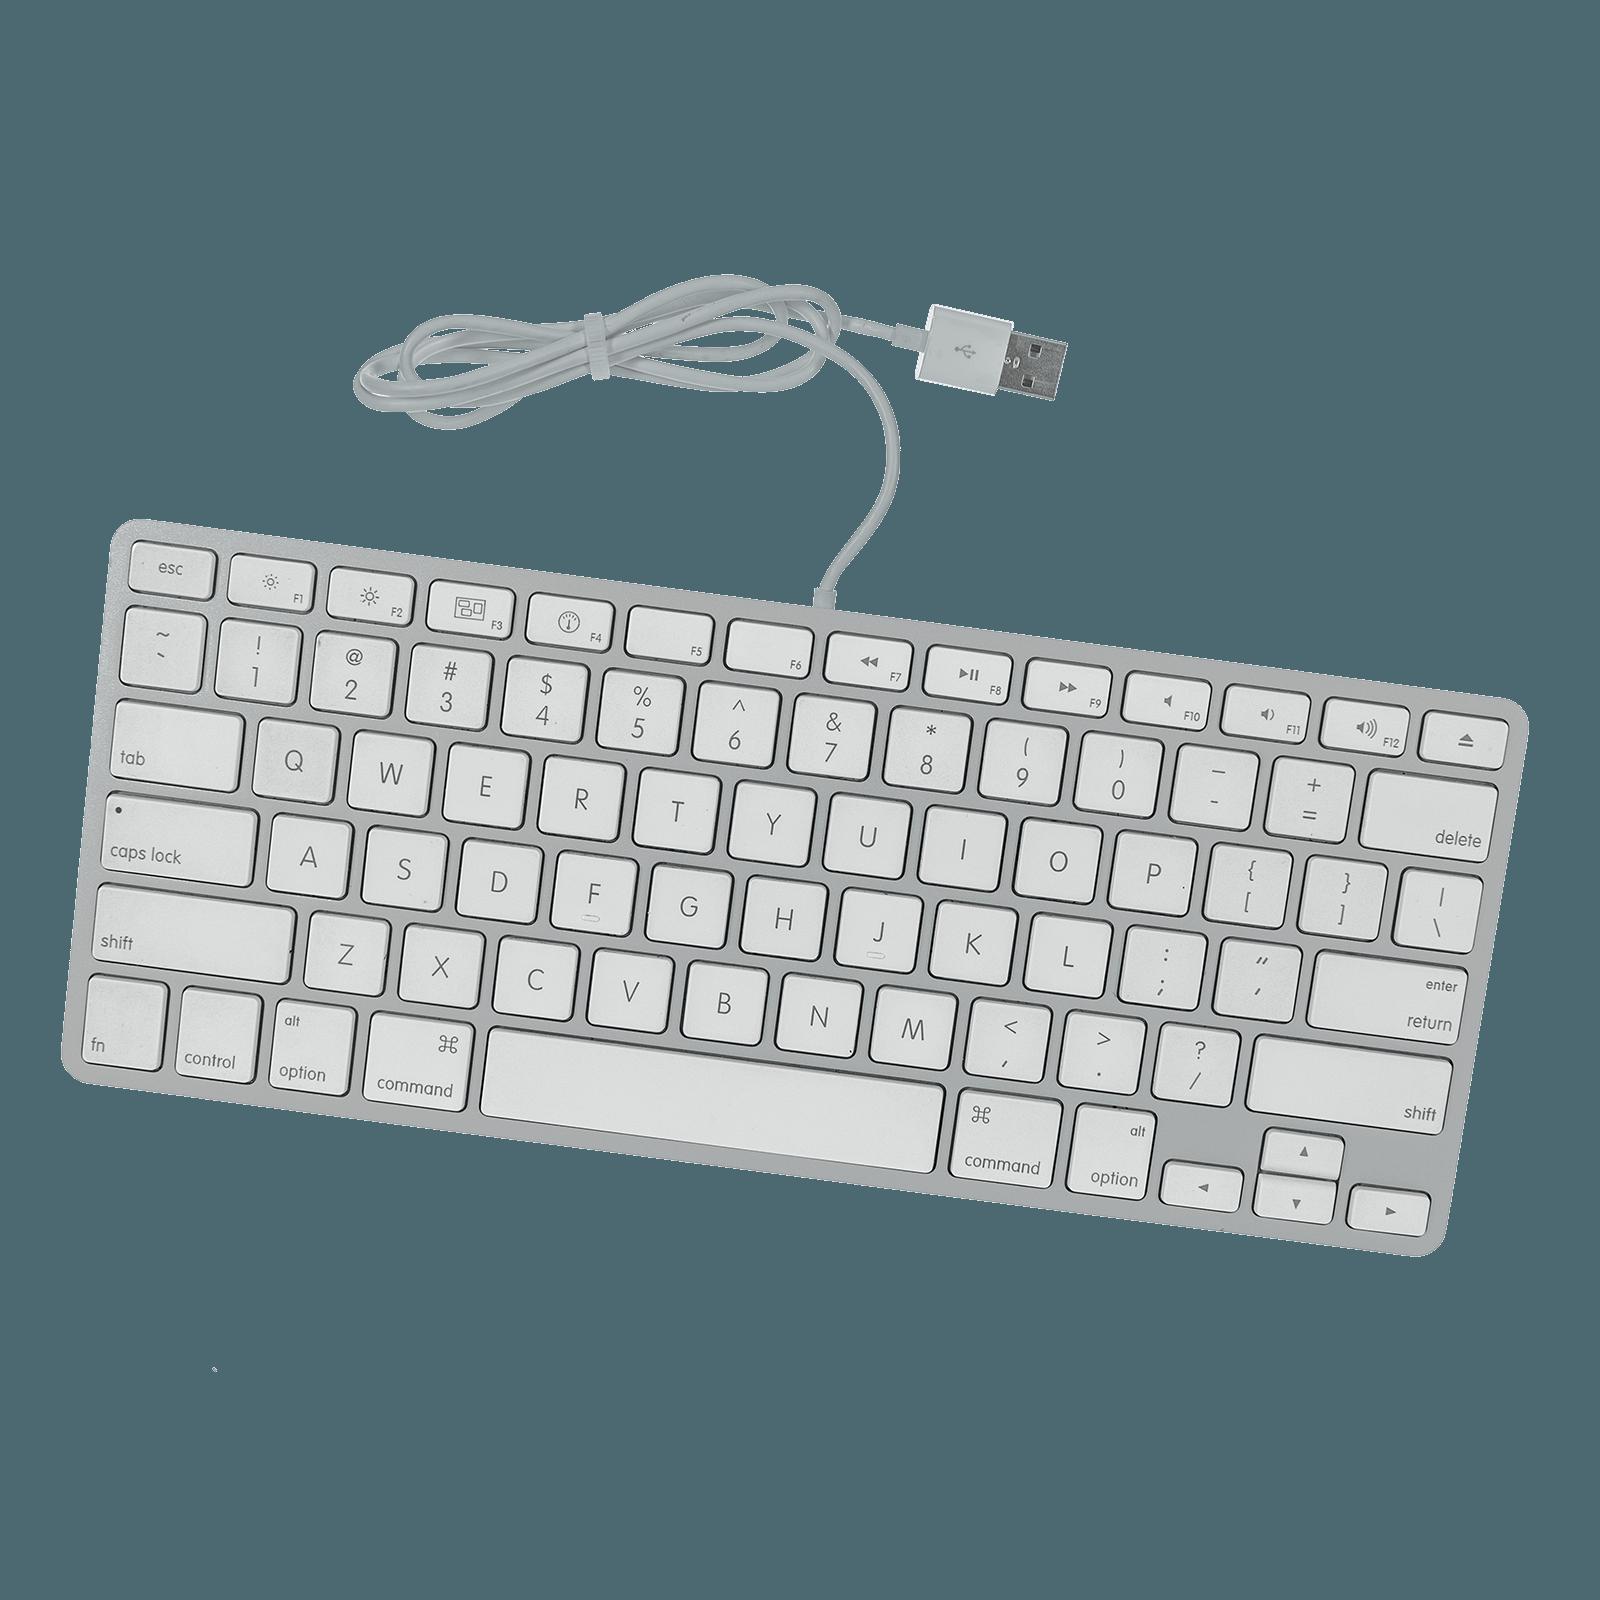 Keyboards & Mice » Beetstech